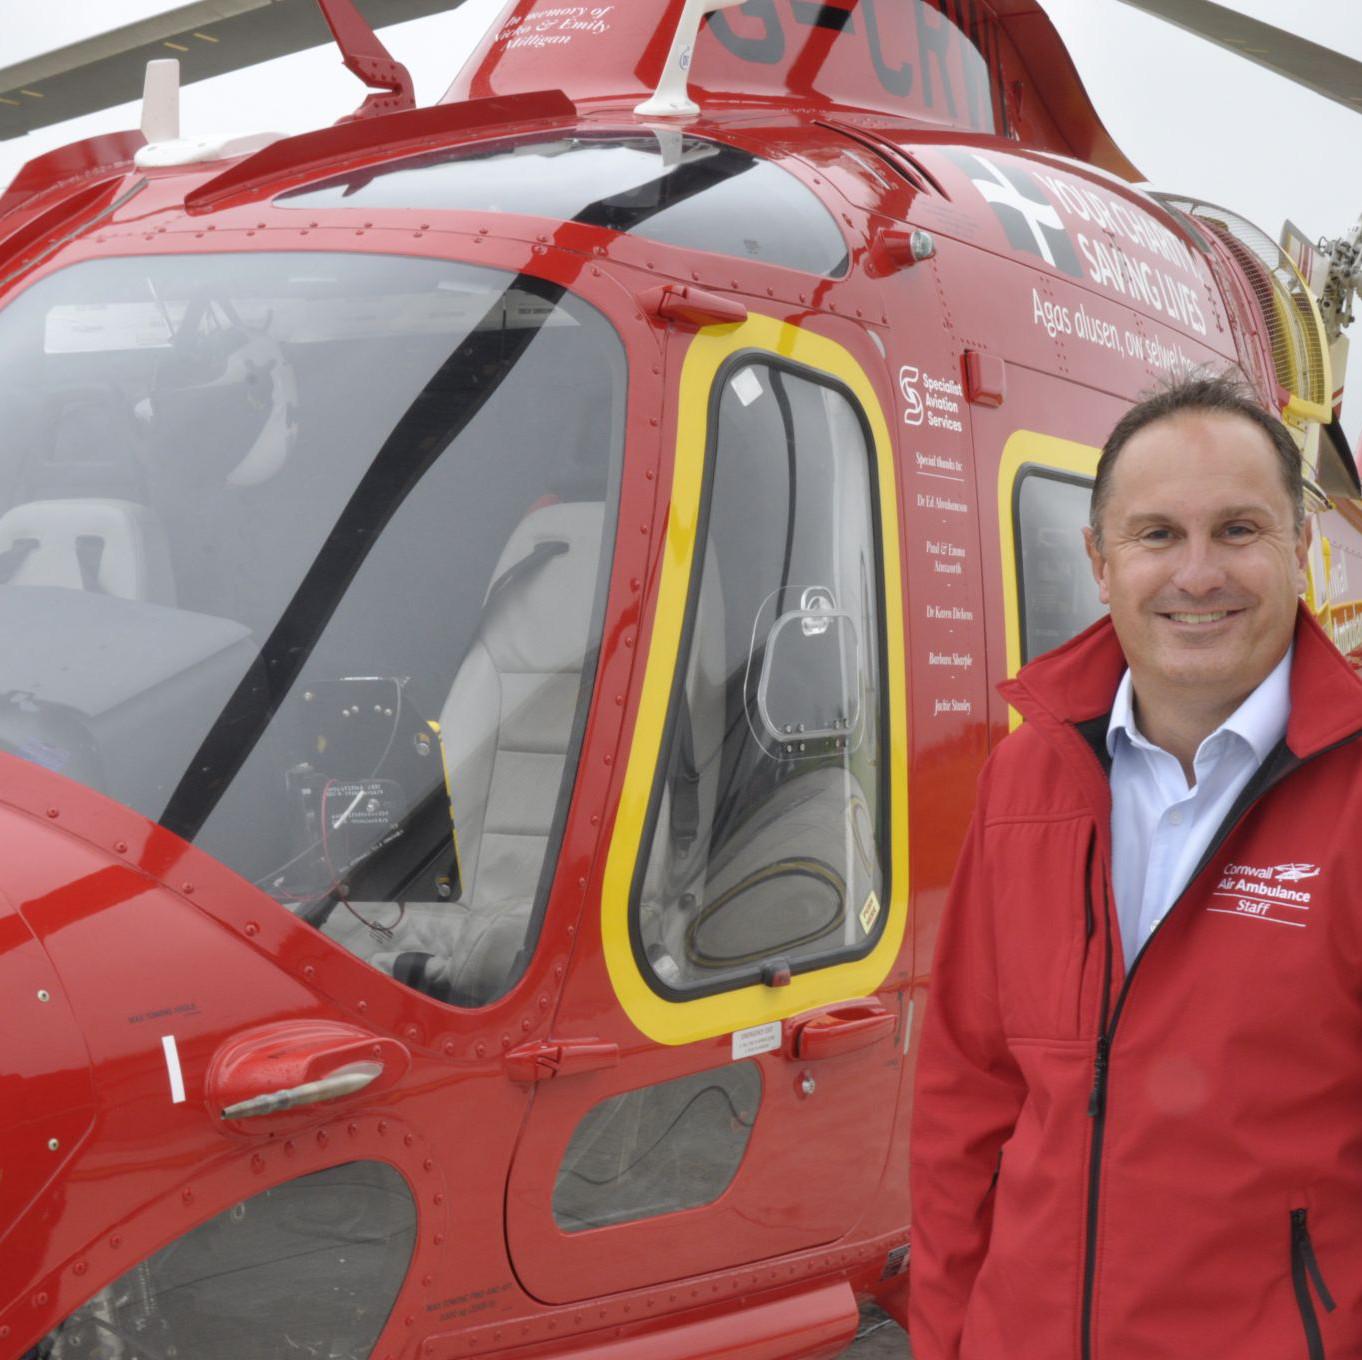 Cornwall Air Ambulance welcomes new CEO